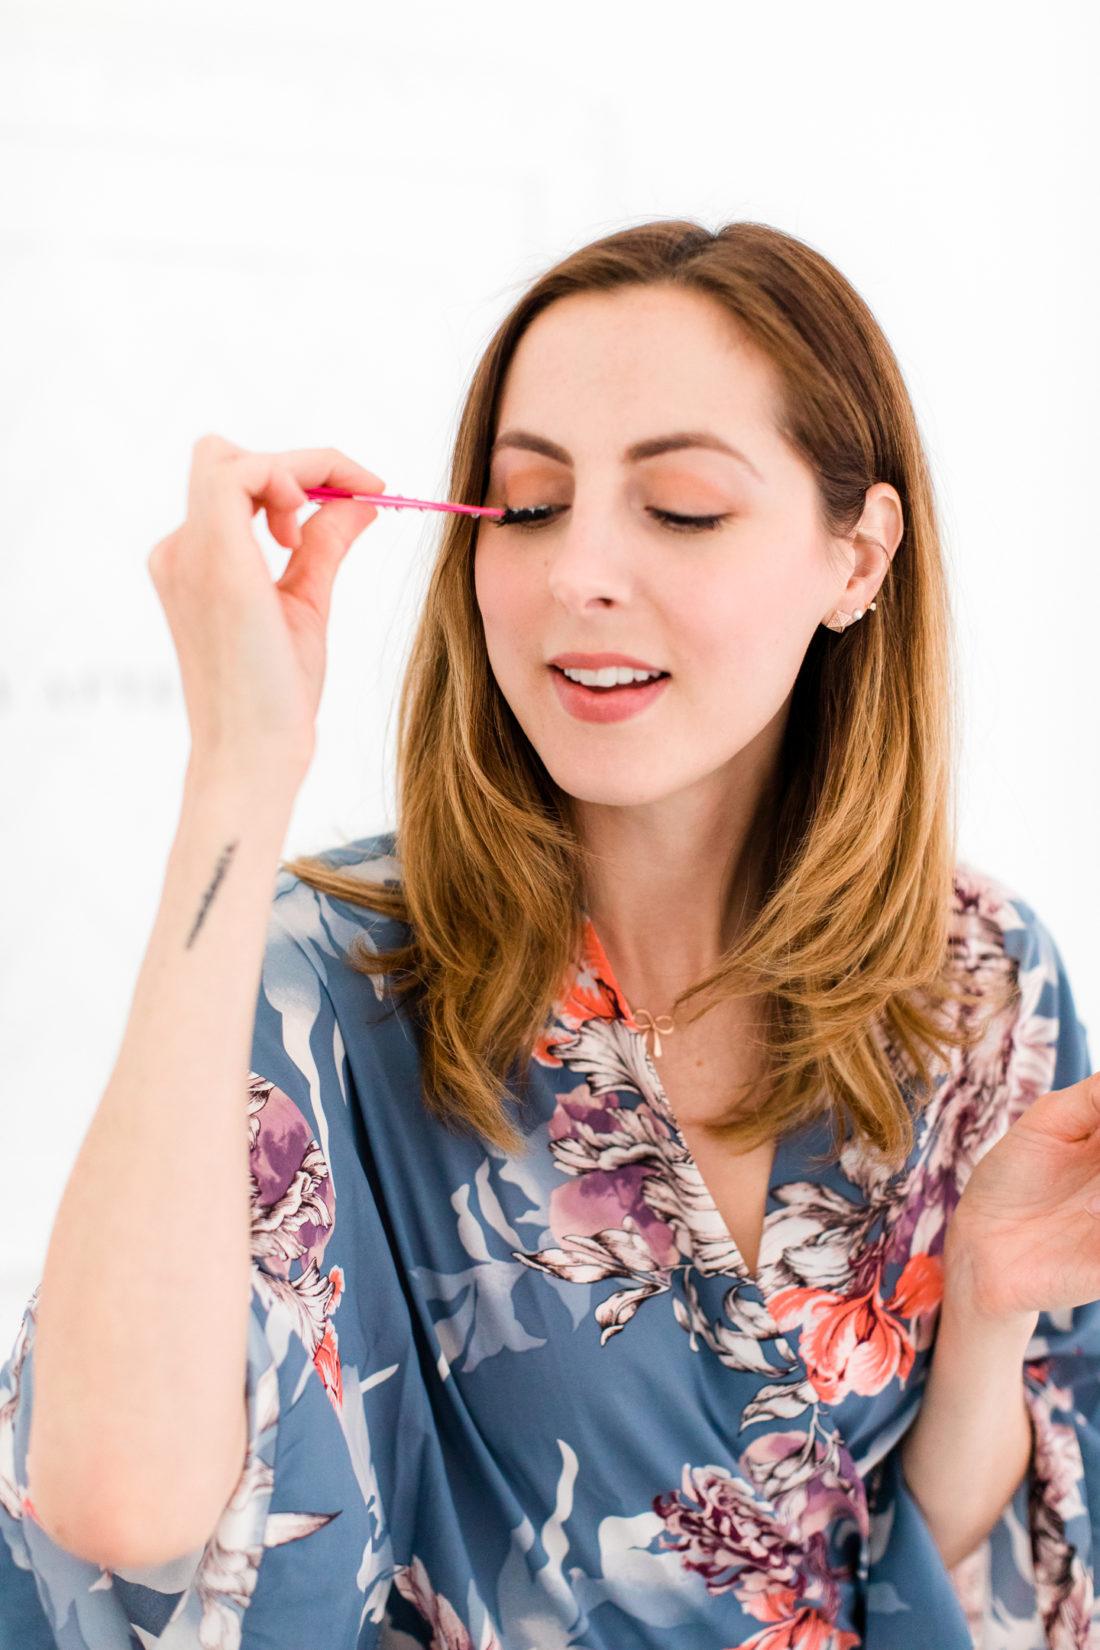 Eva Amurri Martino applies falsh eyelashes as part of her photo shoot makeup tutorial